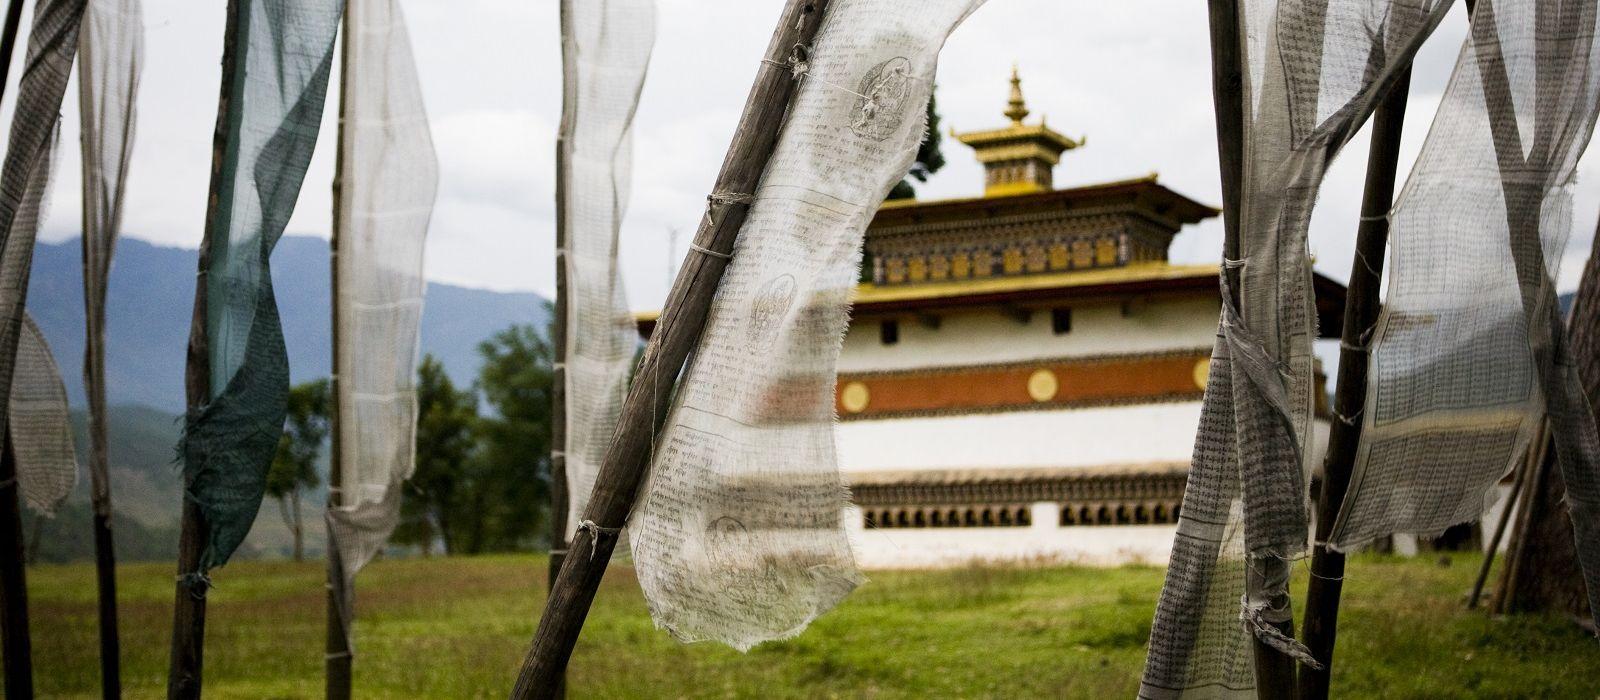 Amankora Exklusivangebot: Luxuriöses Bhutan Urlaub 1